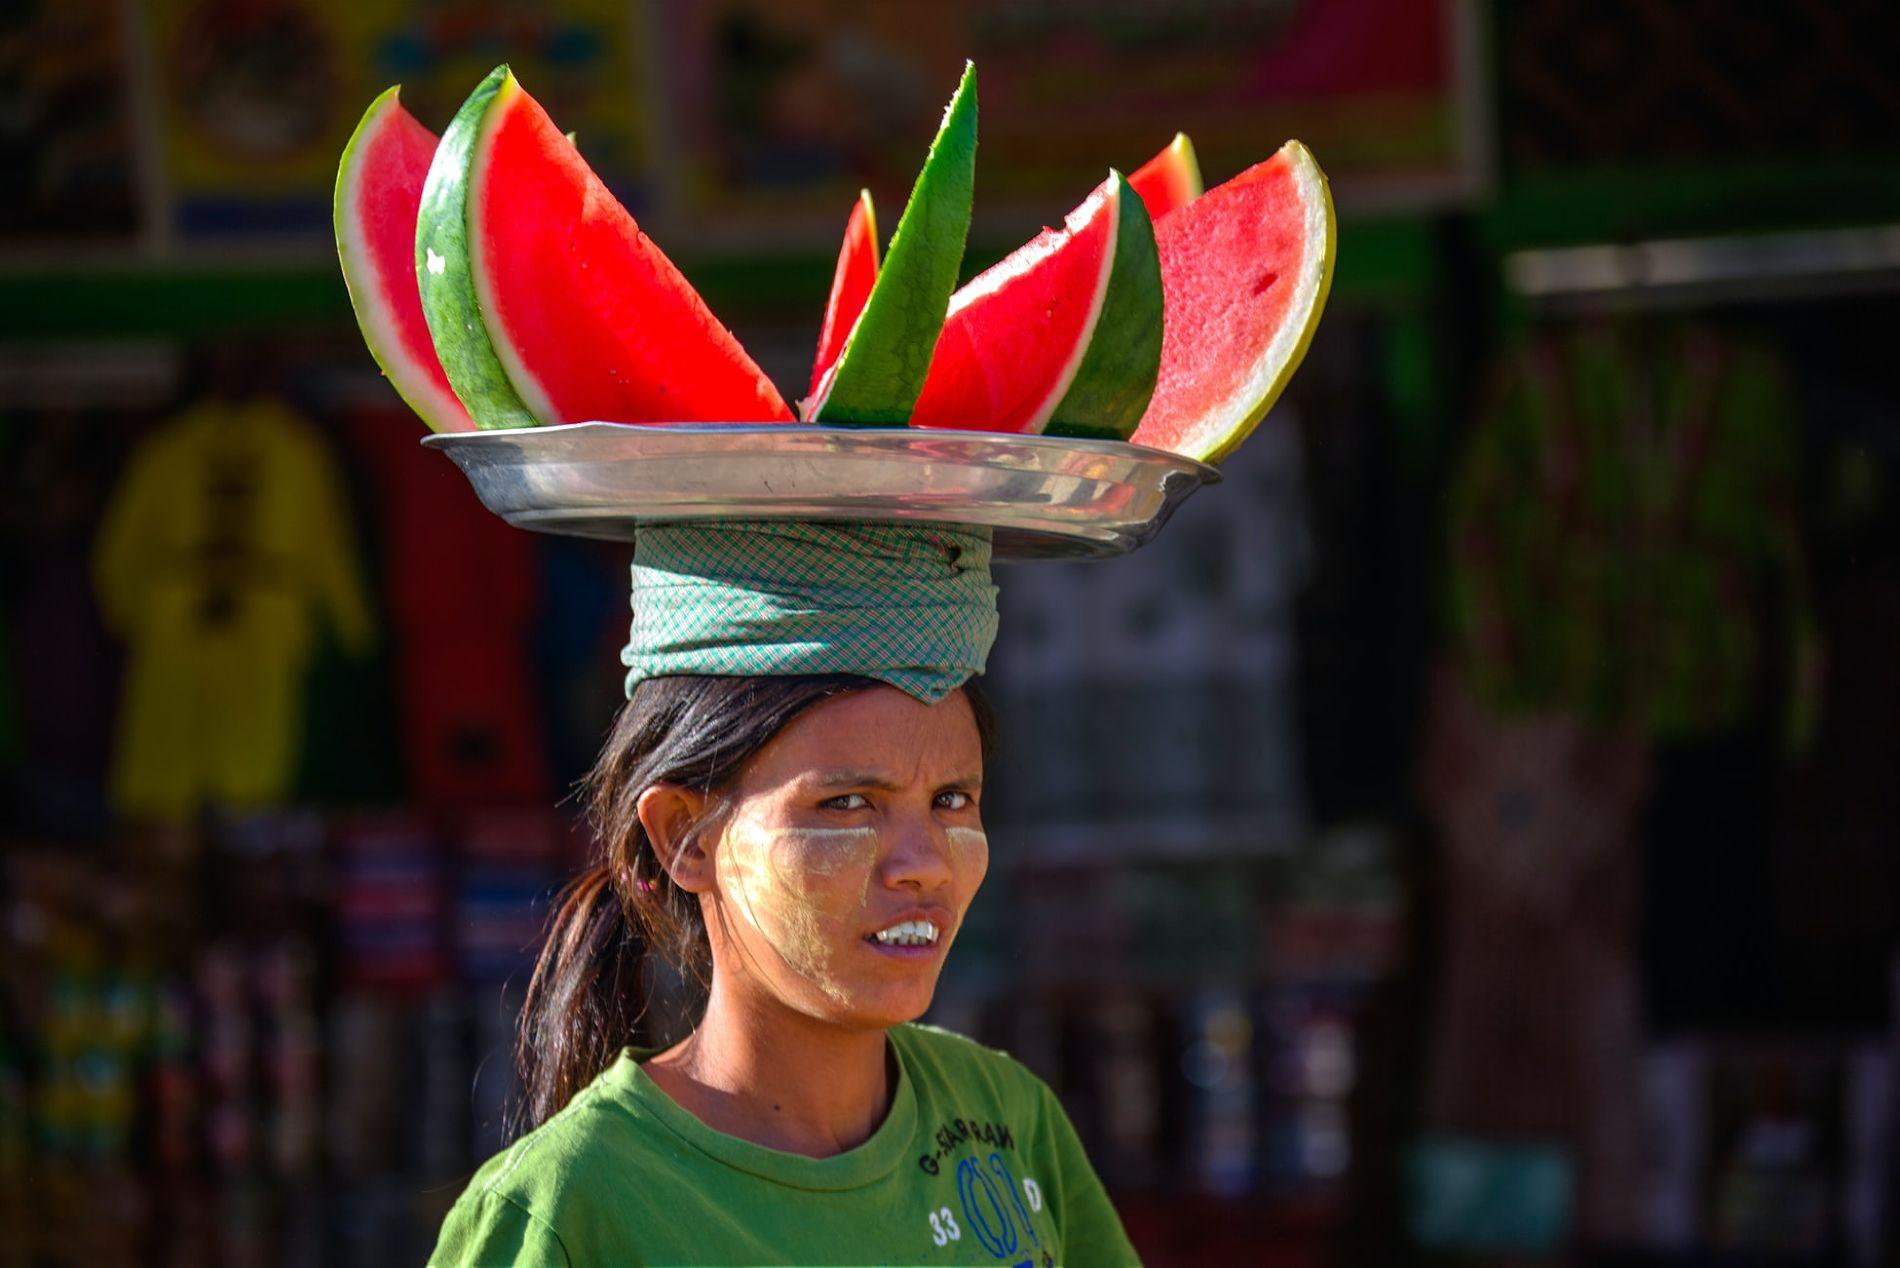 Продавец арбузов в Бирме ©Фото Sippakorn Yamkasikorn, unsplash.com